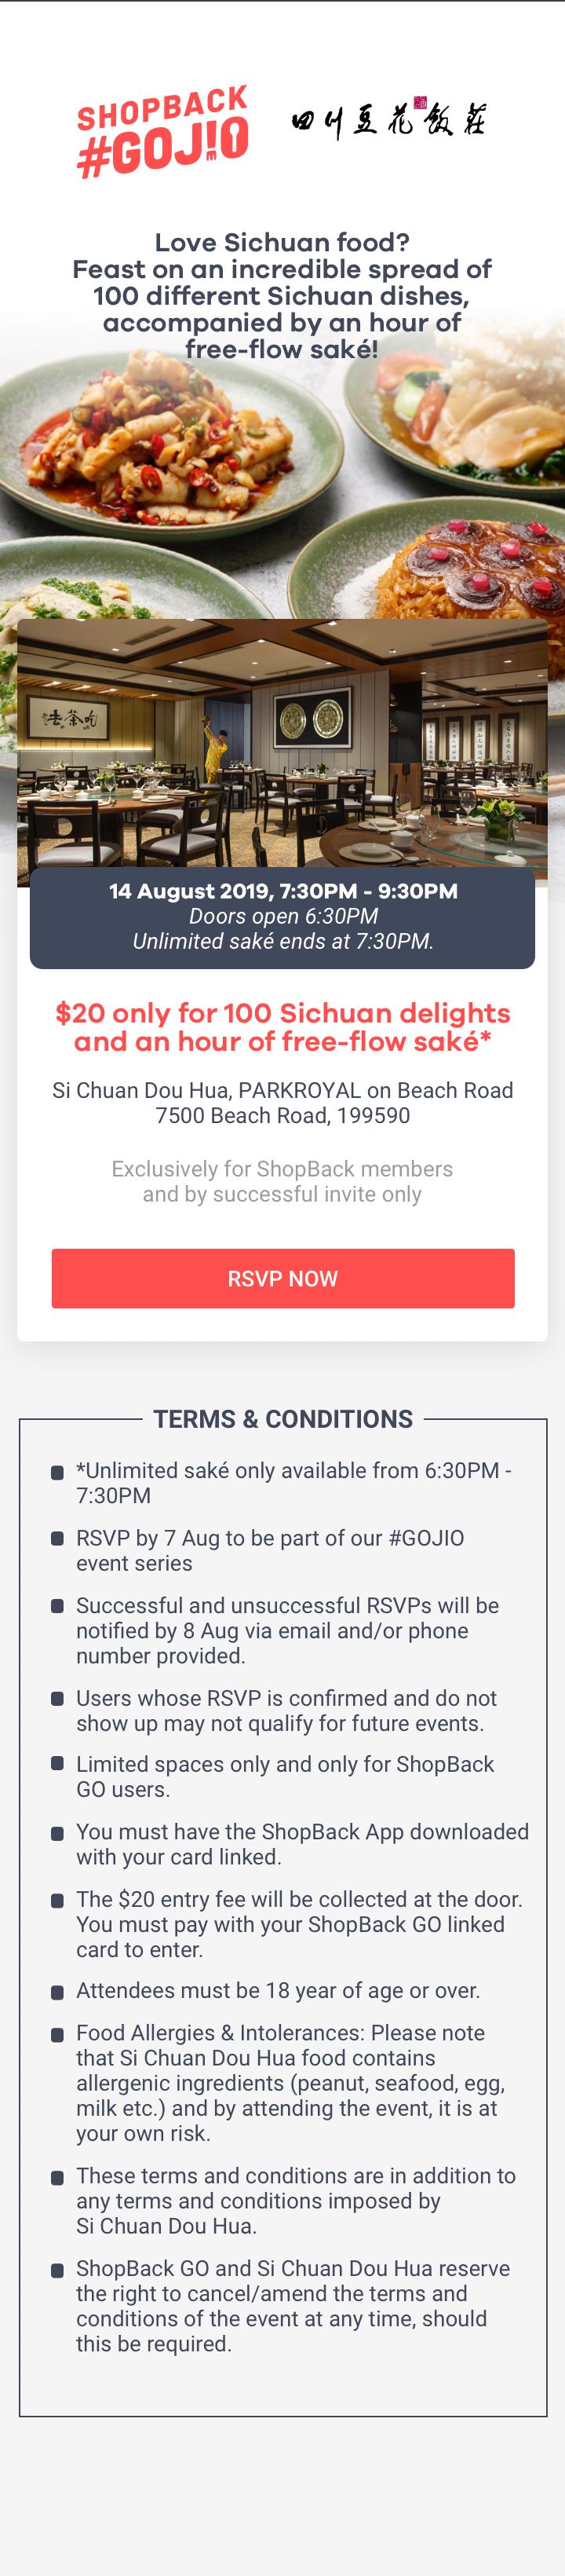 ShopBack GO JIO - Si Chuan Dou Hua